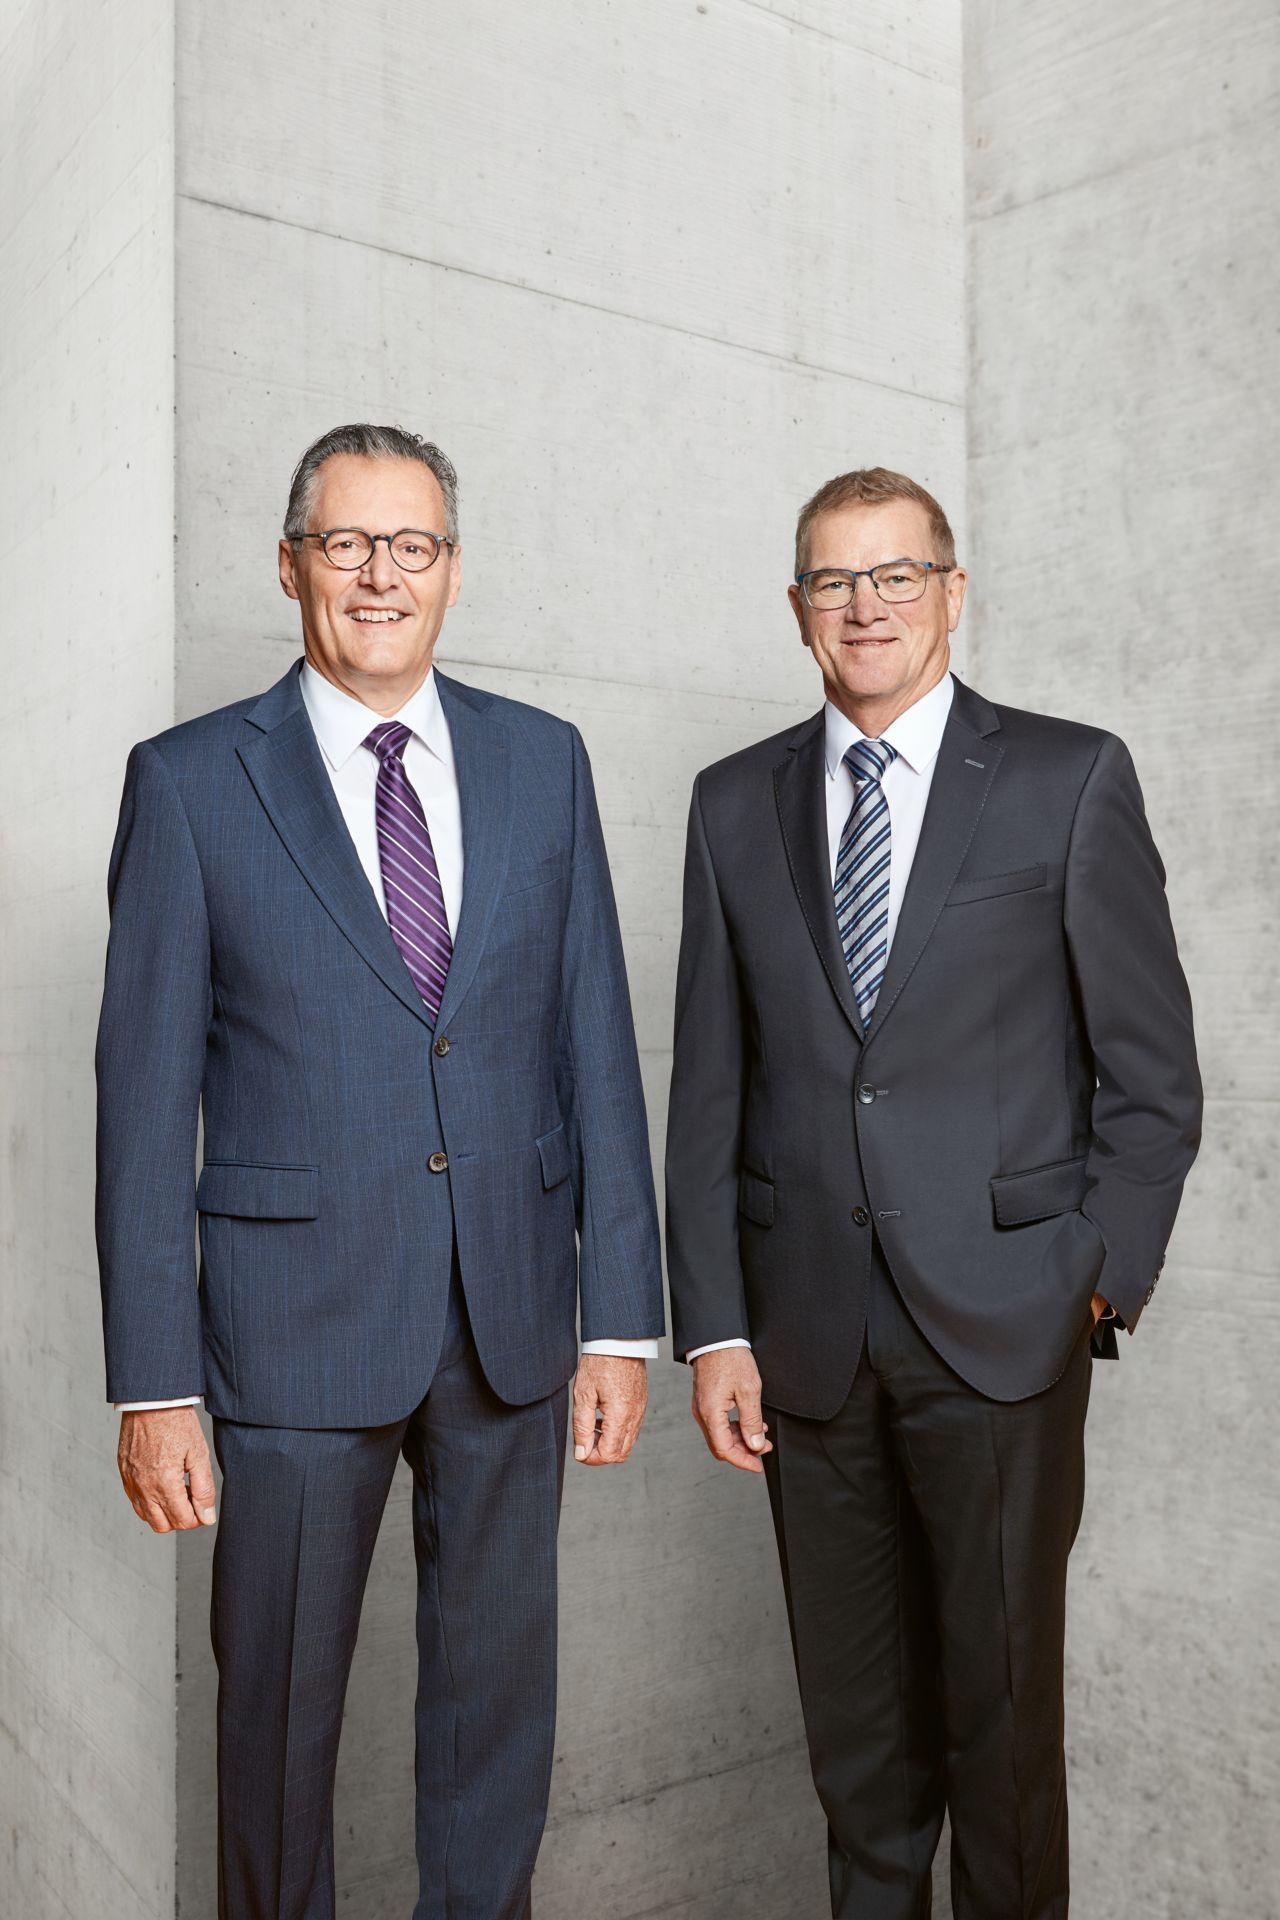 Chairman Paul Haelg and CEO Paul Schuler